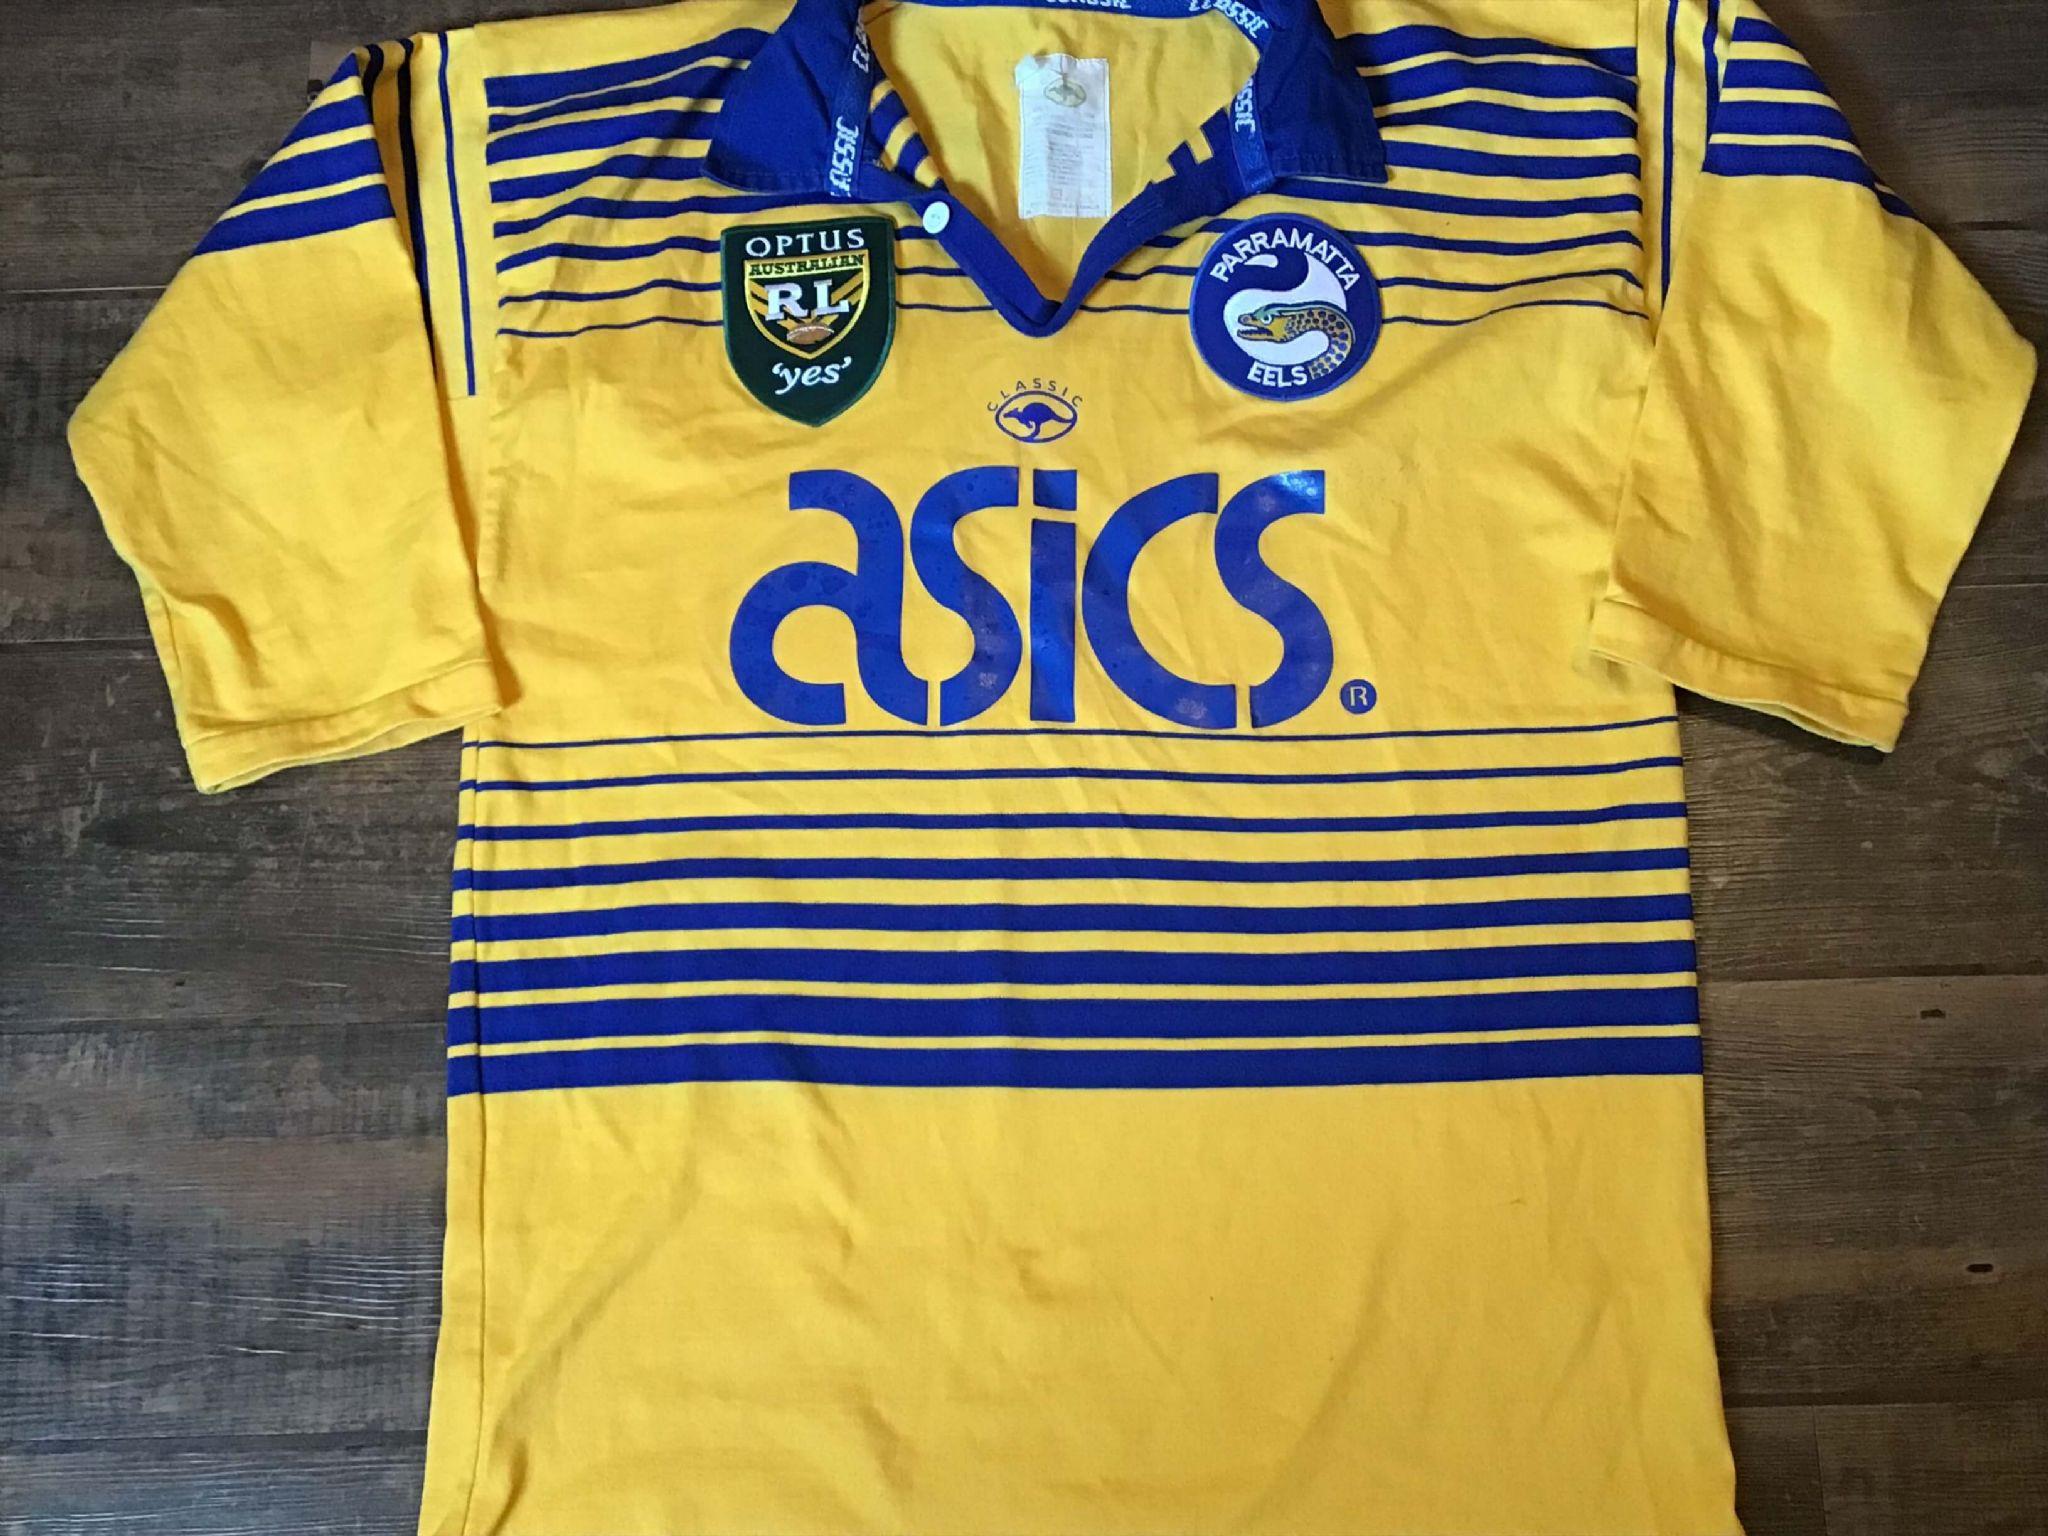 ca30151eca56 1997 Parramatta Eels Rugby League Shirt Adults XL